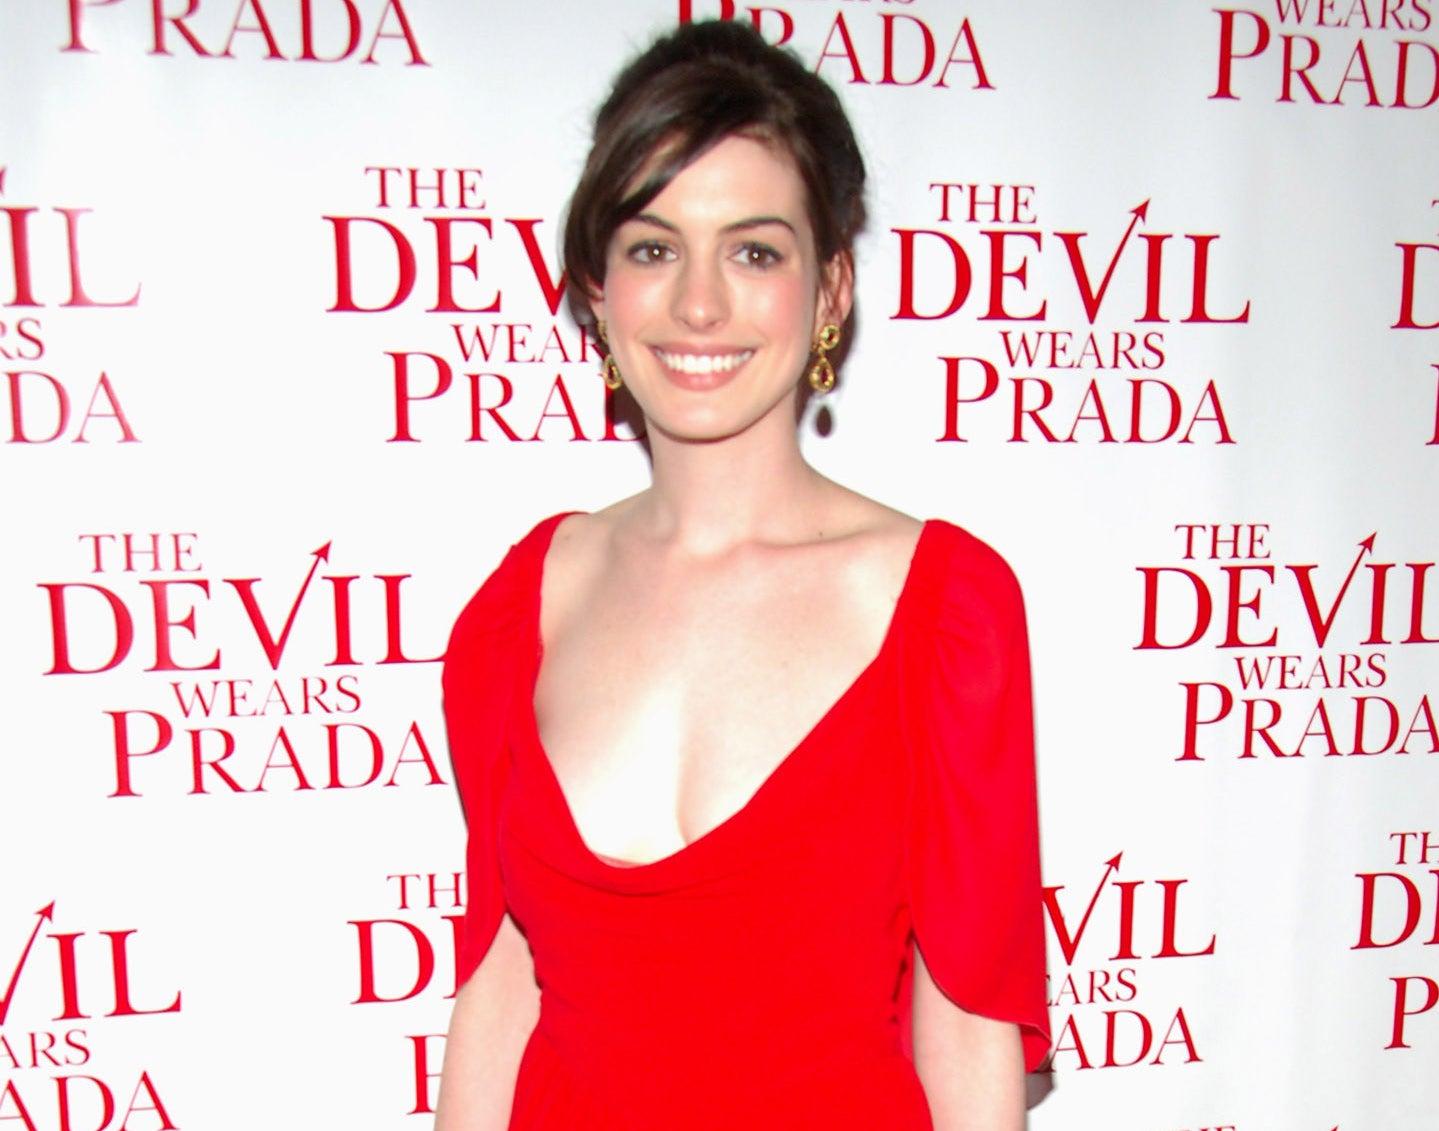 Anne attends the premiere of Devil Wears Prada